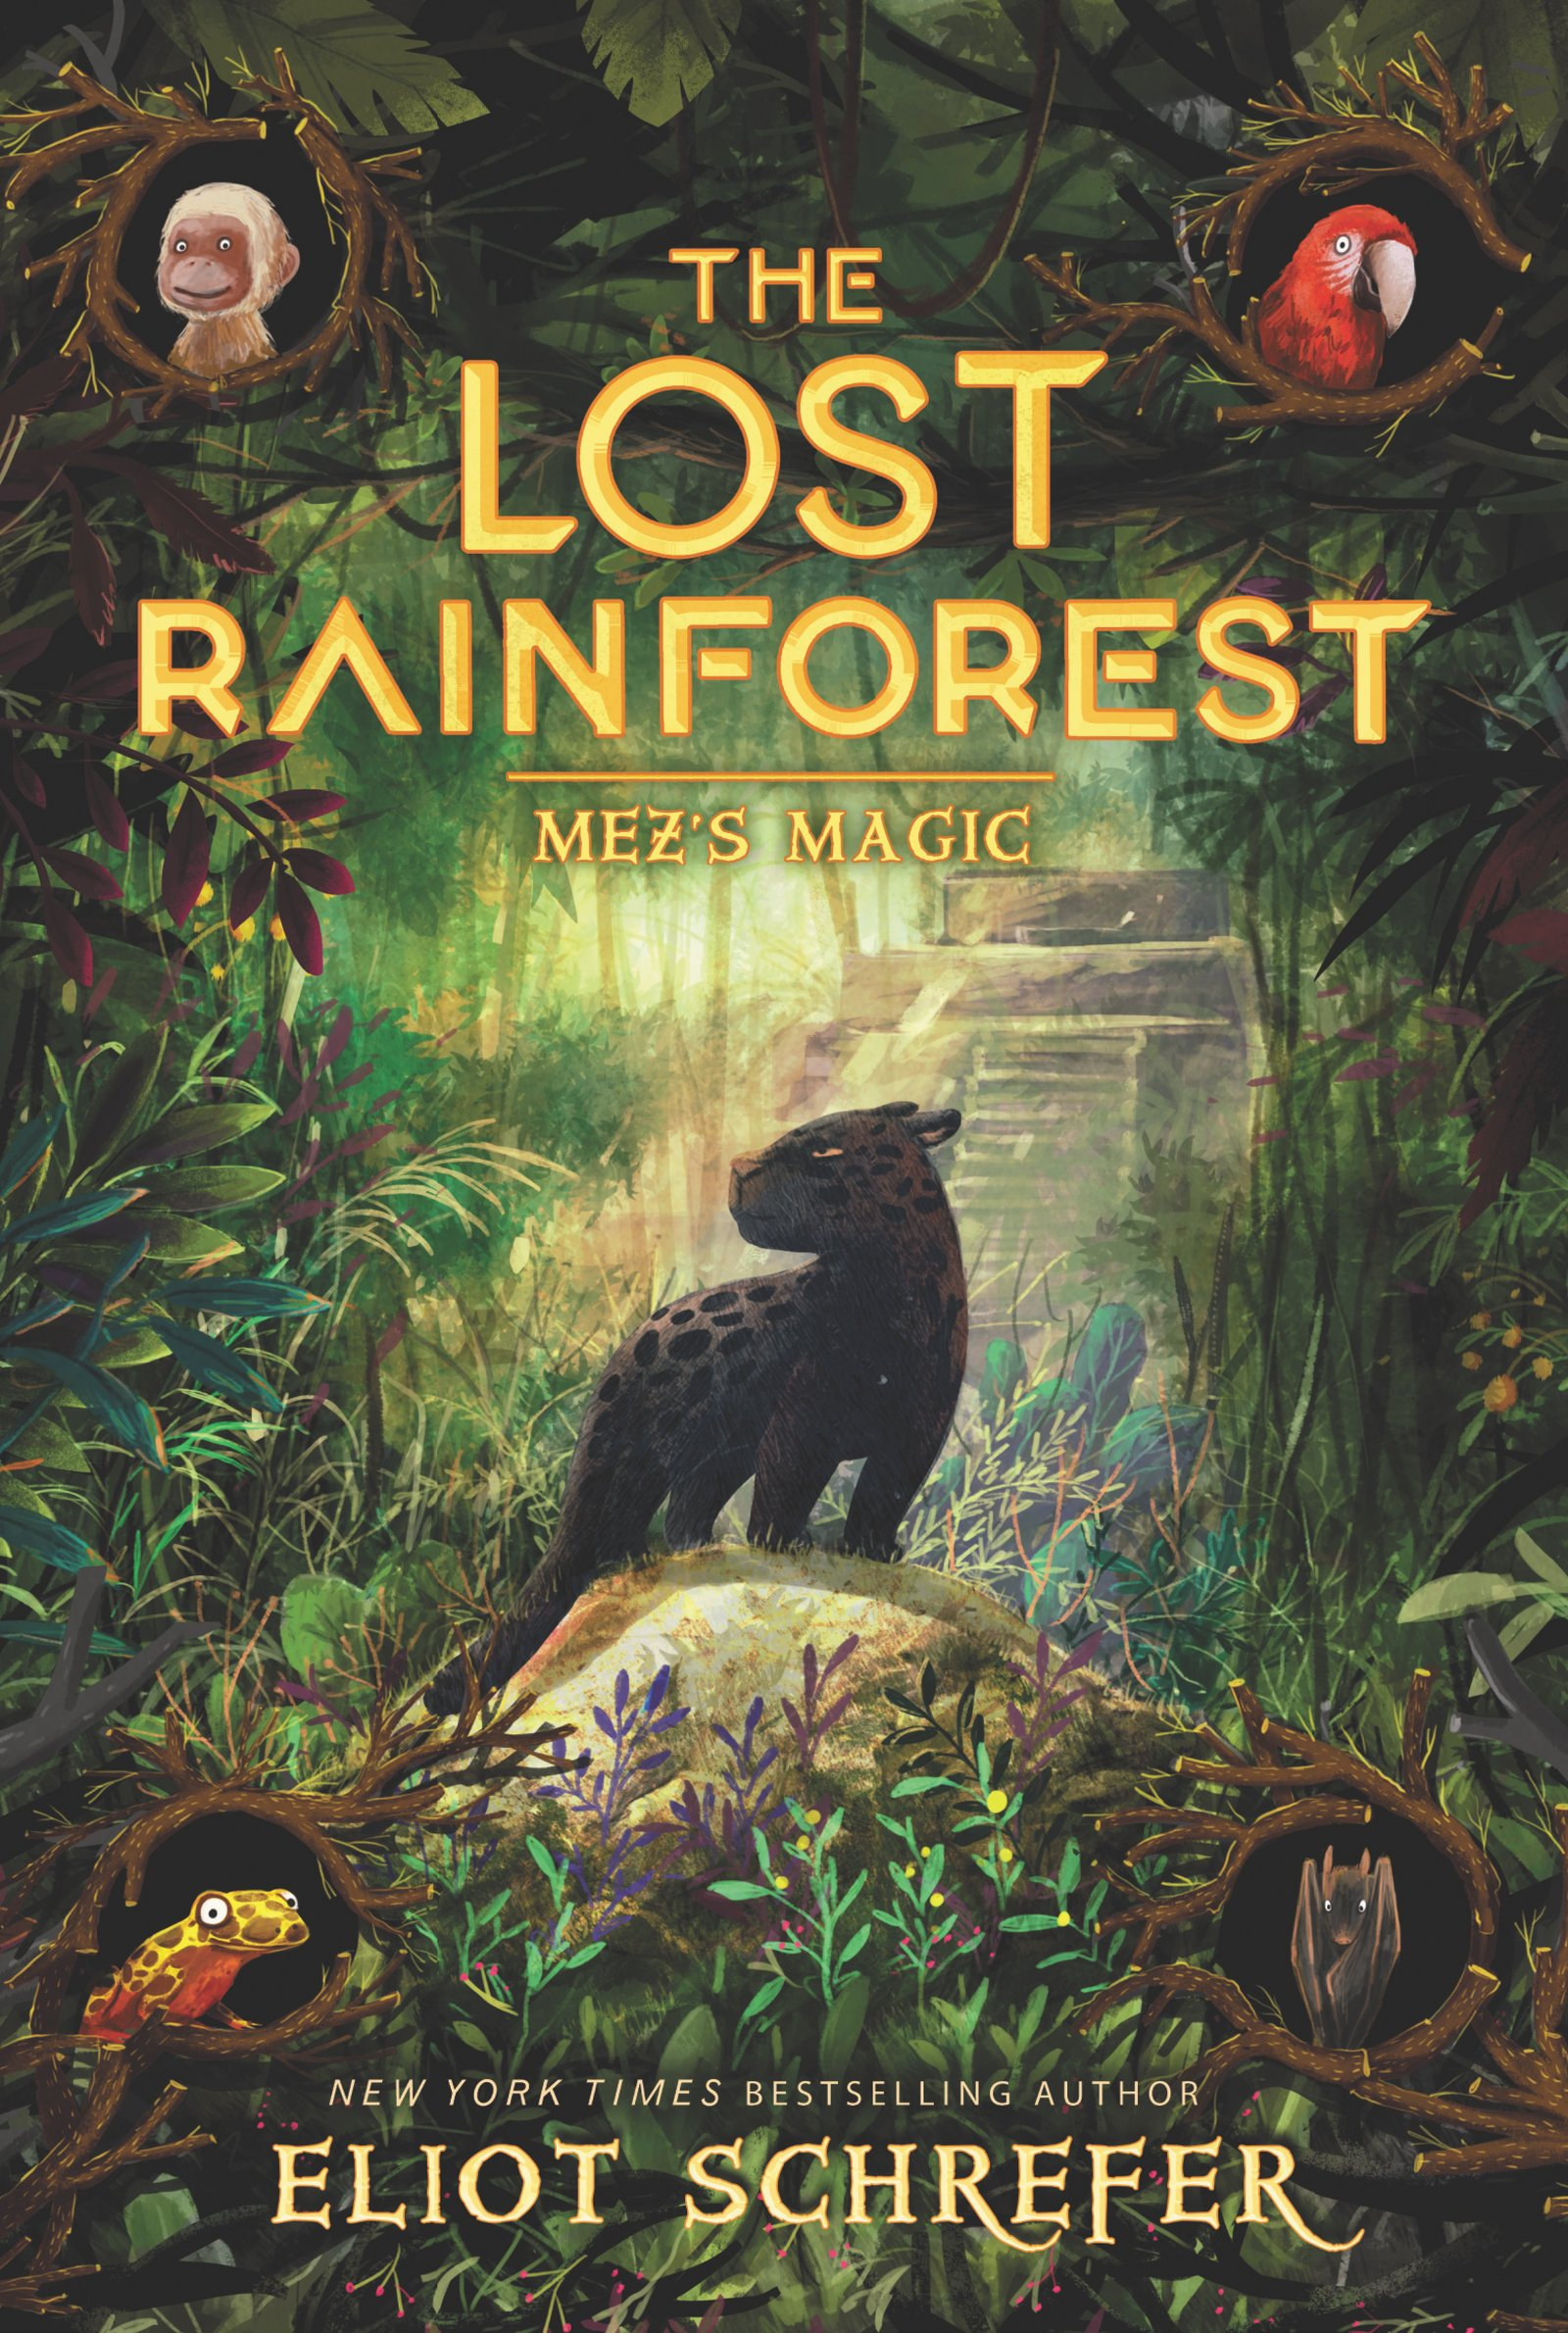 The Lost Rainforest #1: Mez's Magic: Schrefer, Eliot, Dziubak, Emilia:  9780062491138: Amazon.com: Books